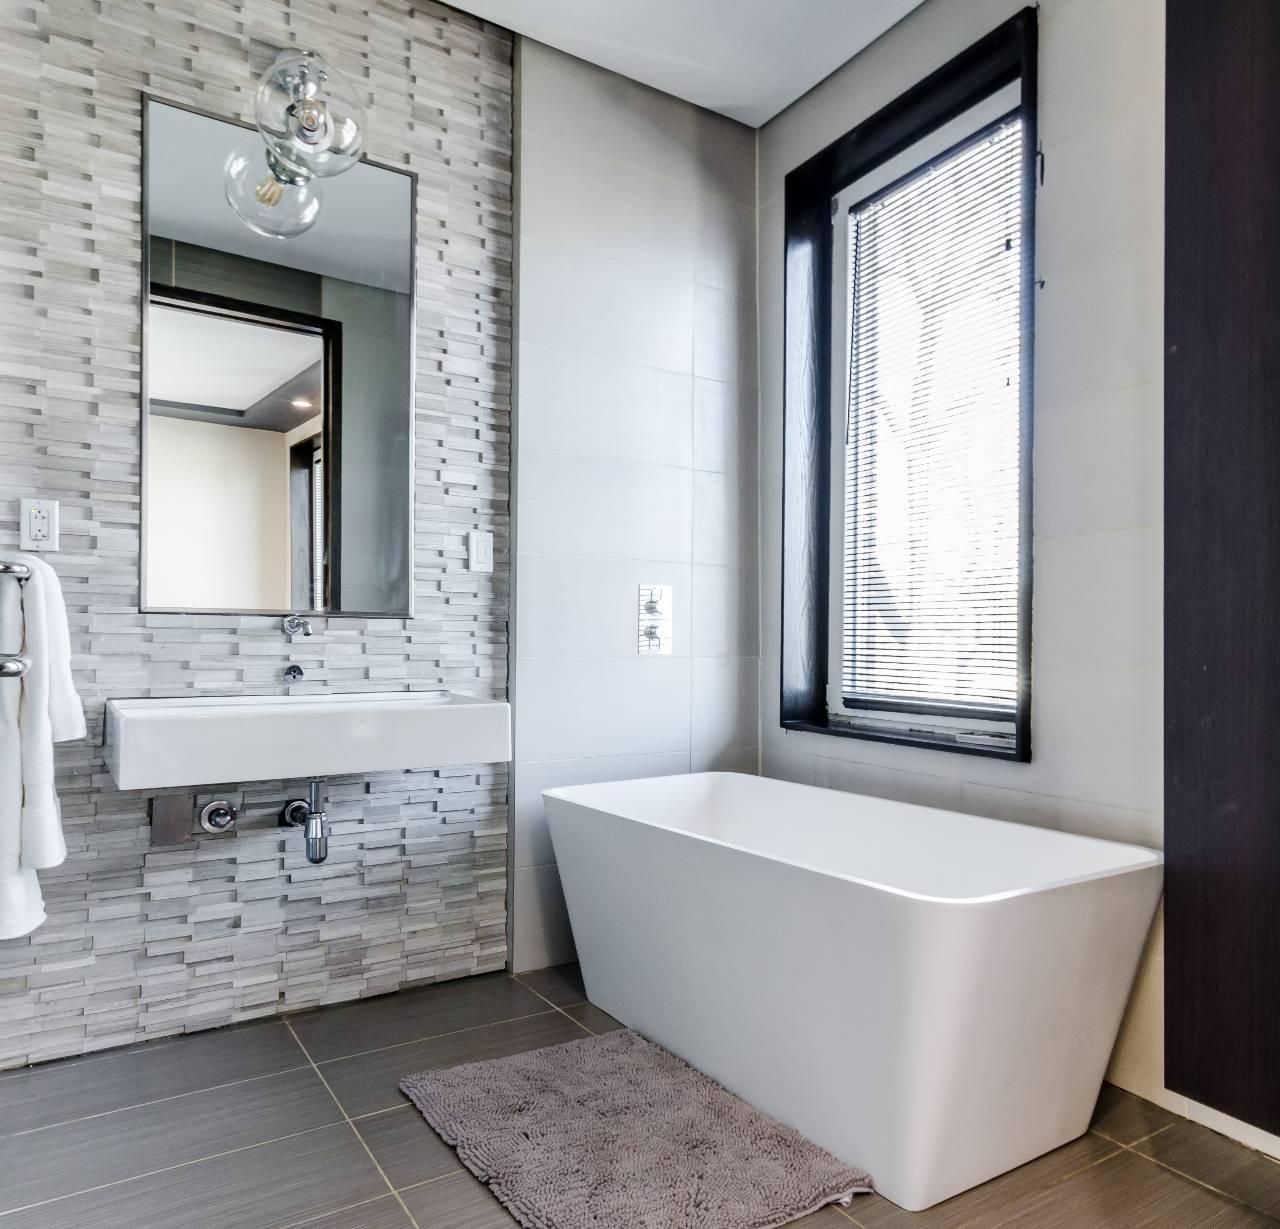 Bathroom Installer in Dorchester